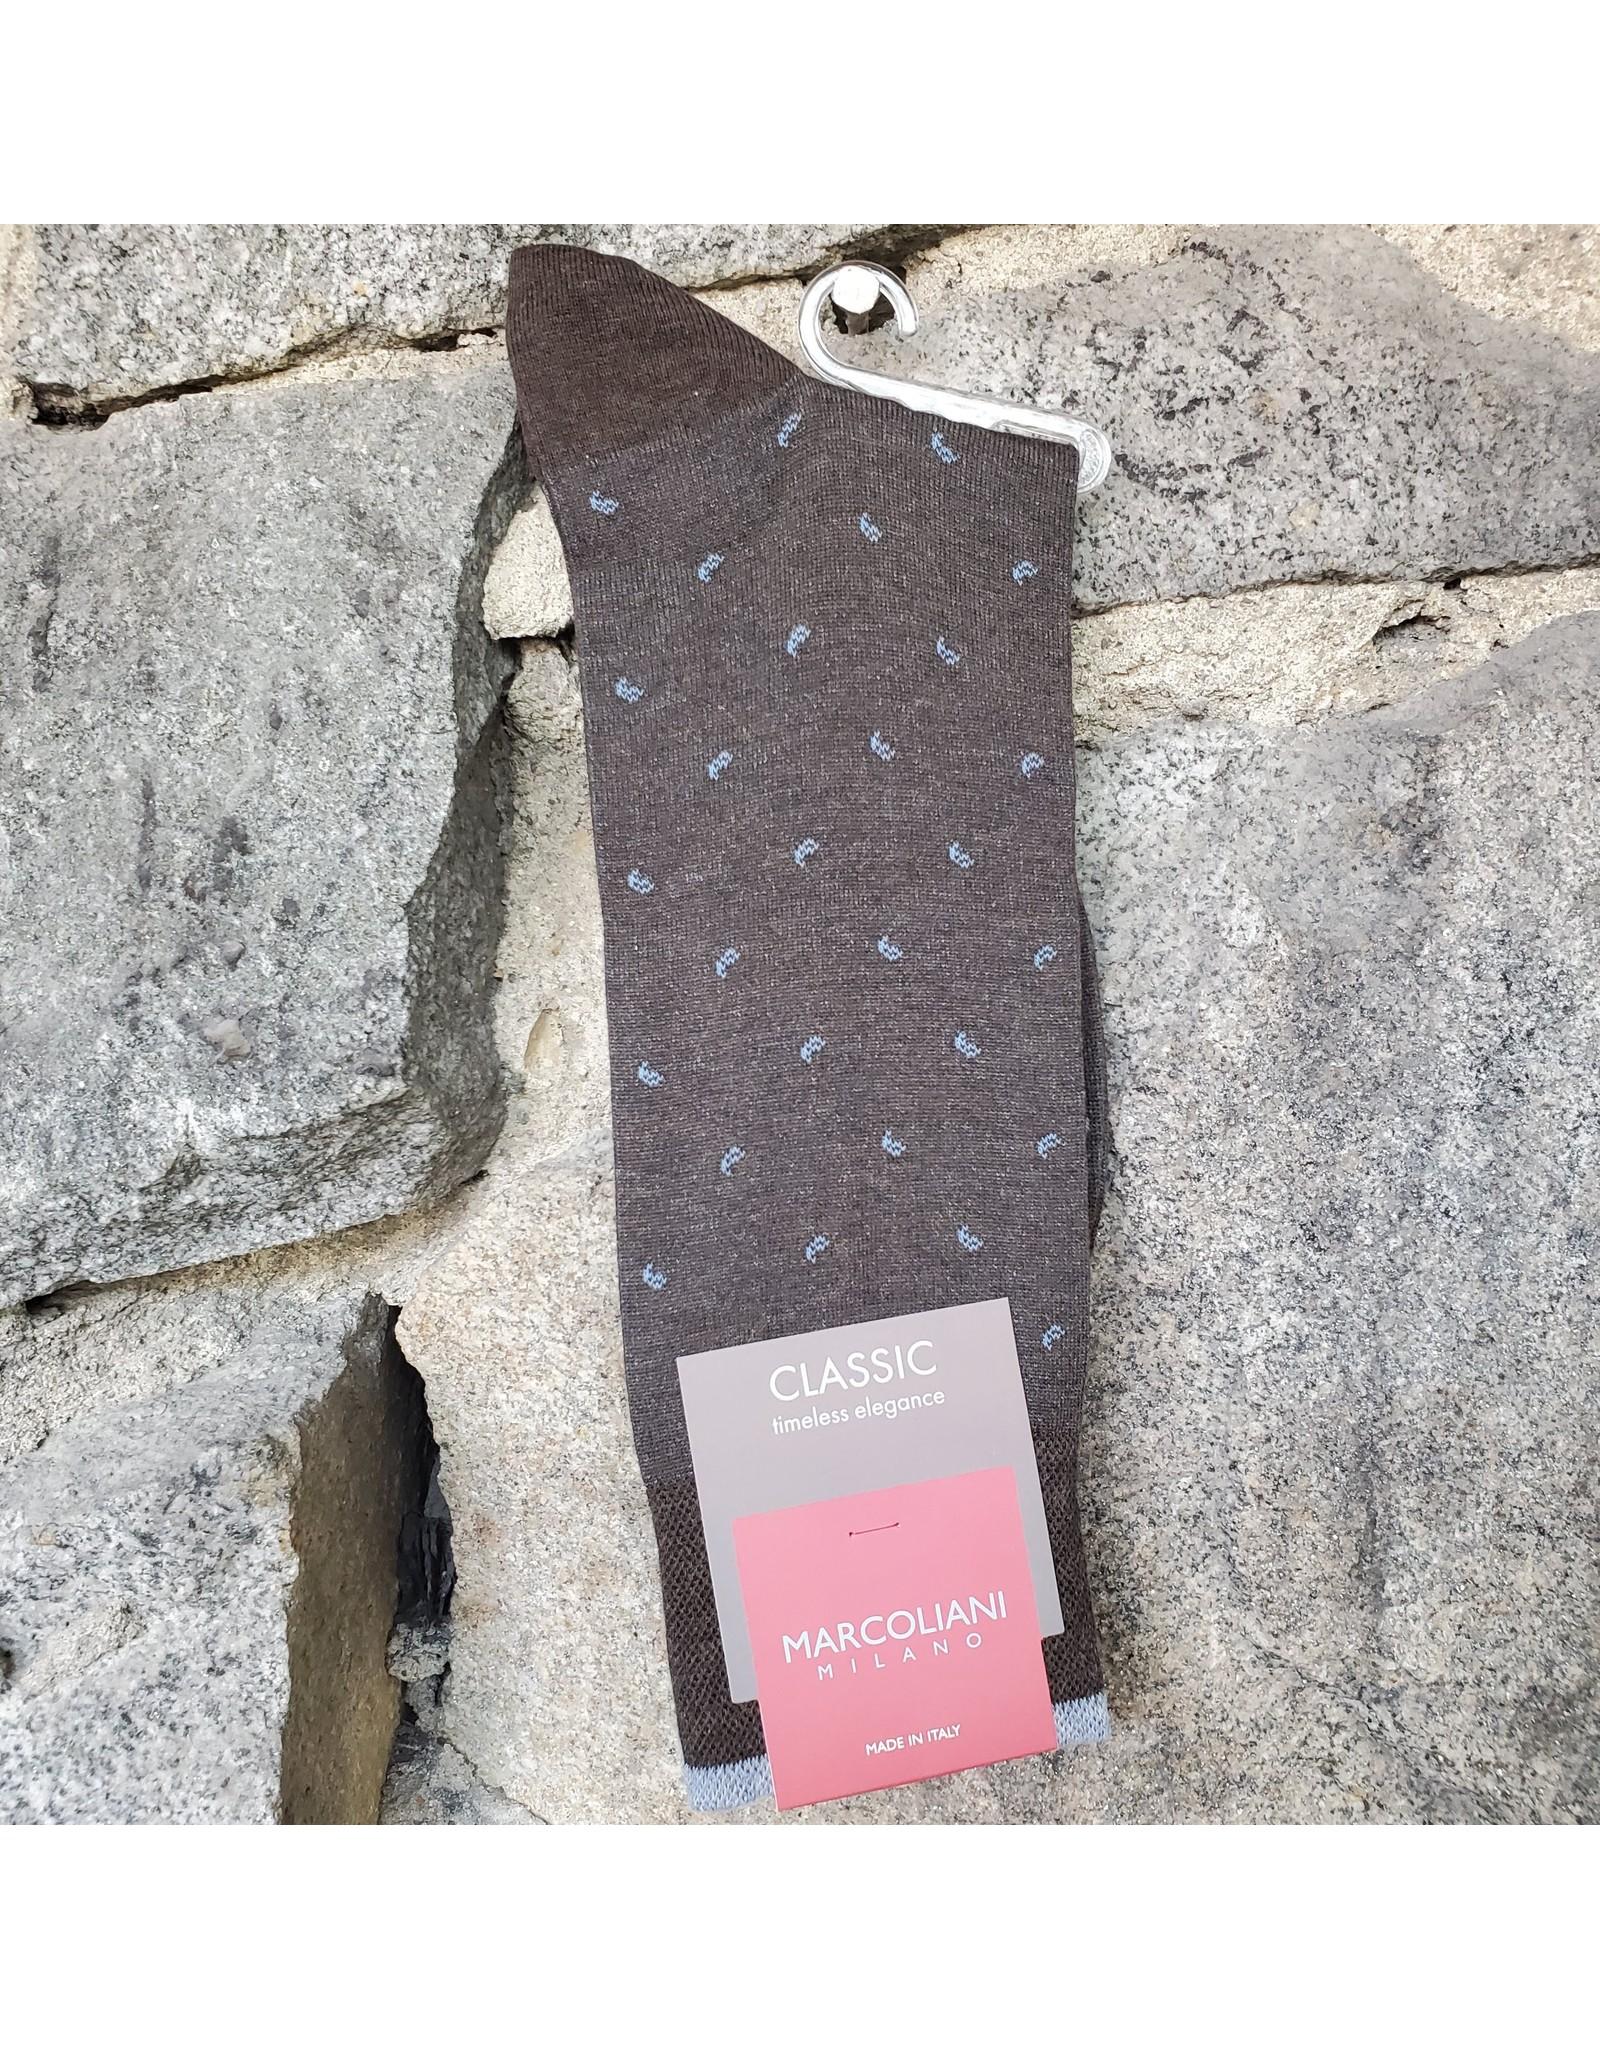 Marcoliani Marcoliani Pima Cotton Socks - Coffee Lisle Micro Paisley